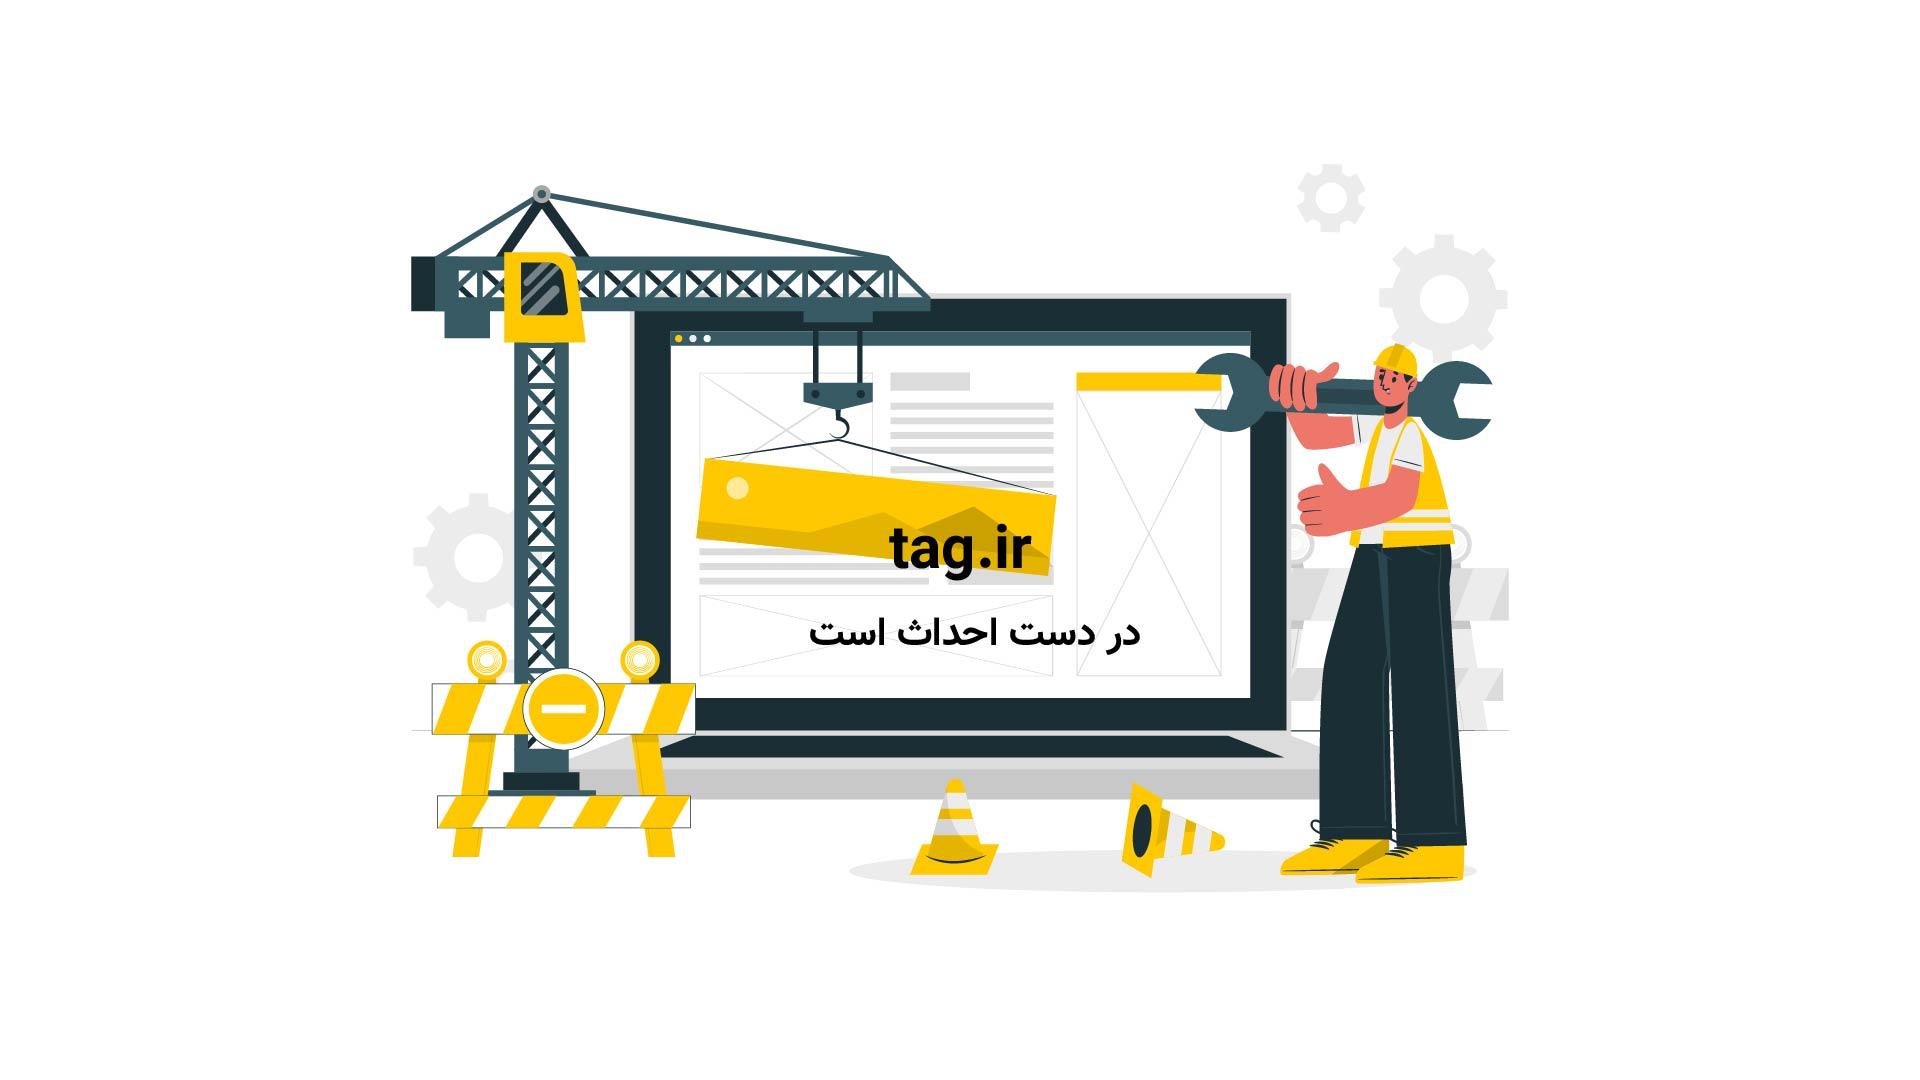 اسکی روی آب اوباما در دریای کارائیب | فیلم